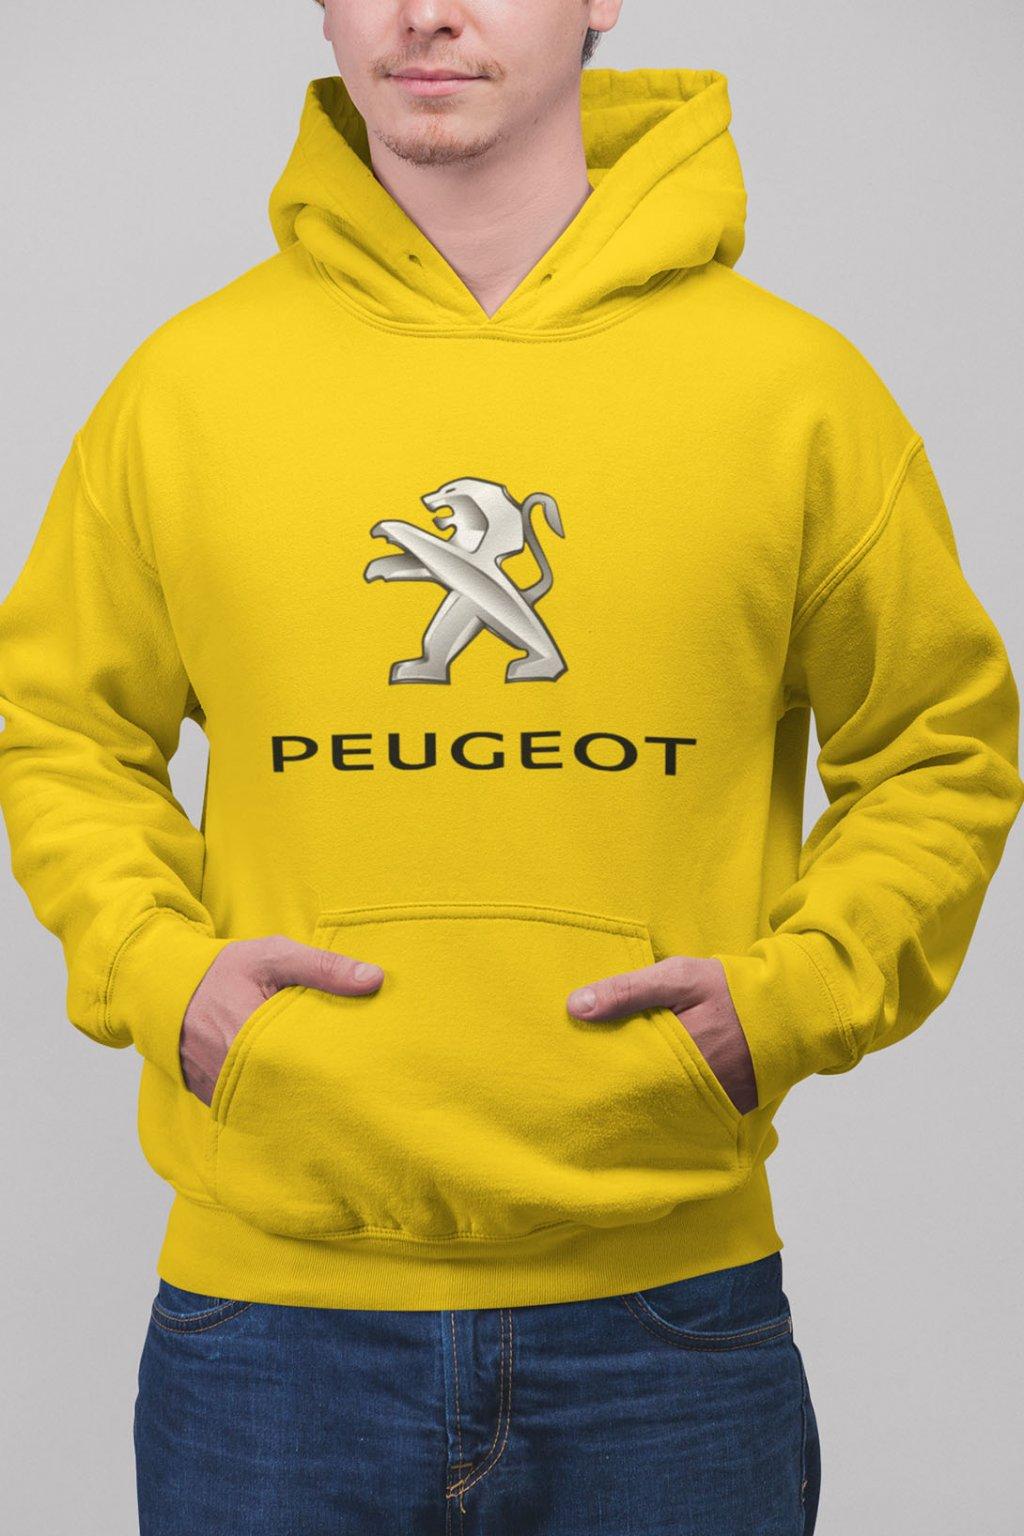 Pánska mikina s logom auta Peugeot